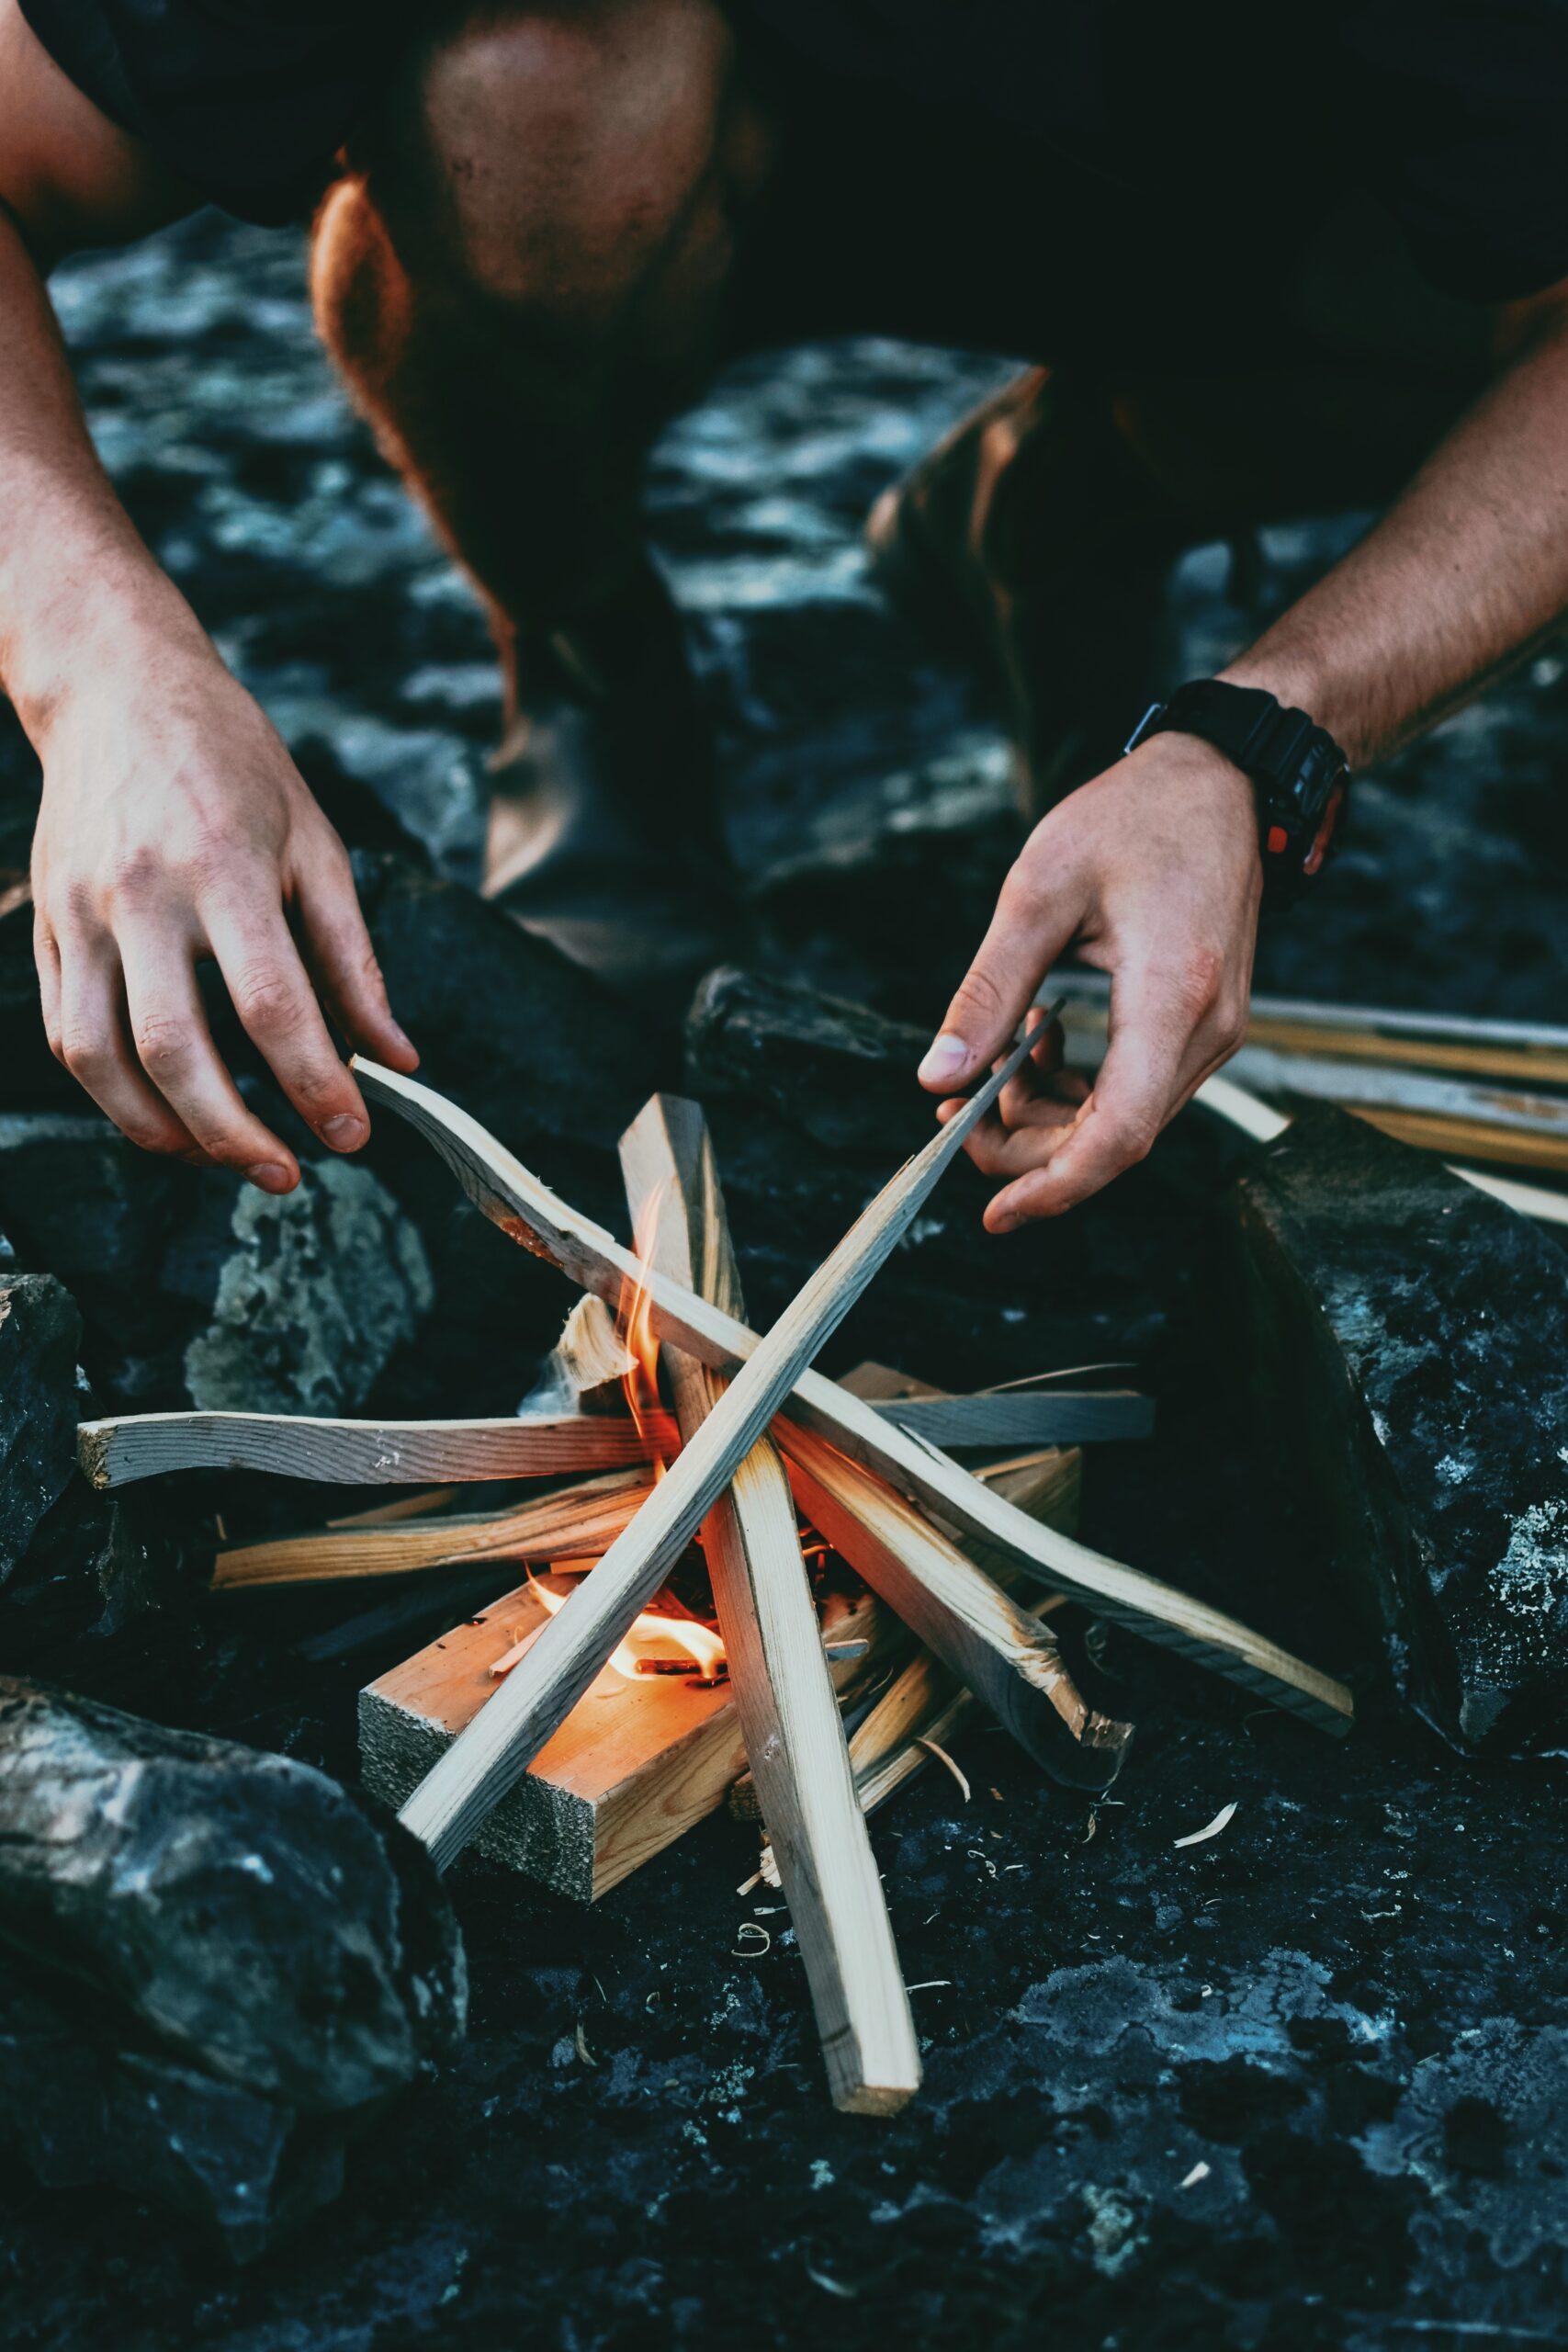 I fondamentali sul kit di sopravvivenza